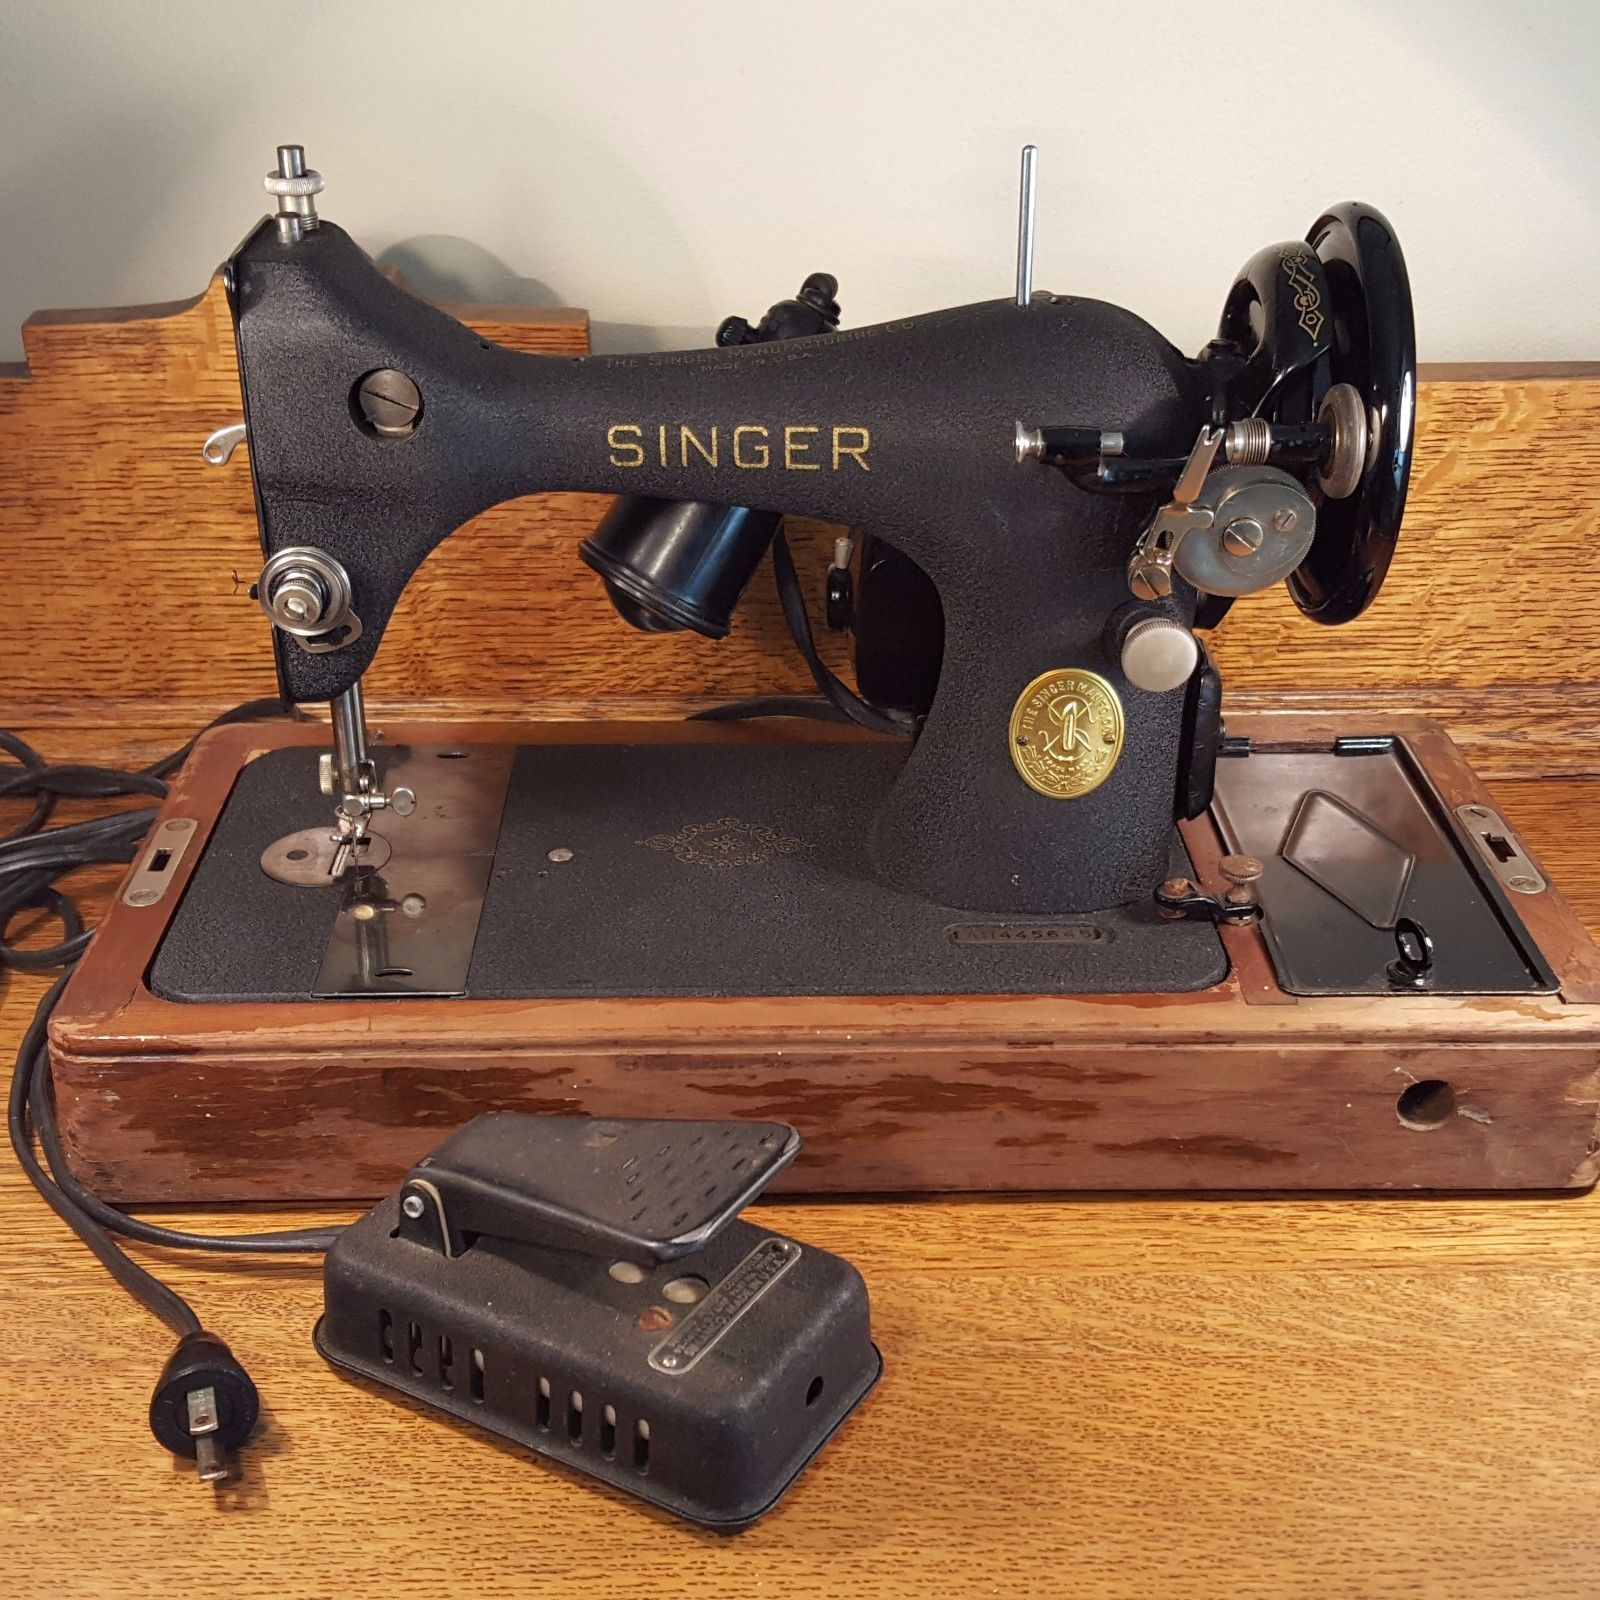 Singer Sewing Machine Model 128 In Bentwood Case Ah445645 Runs